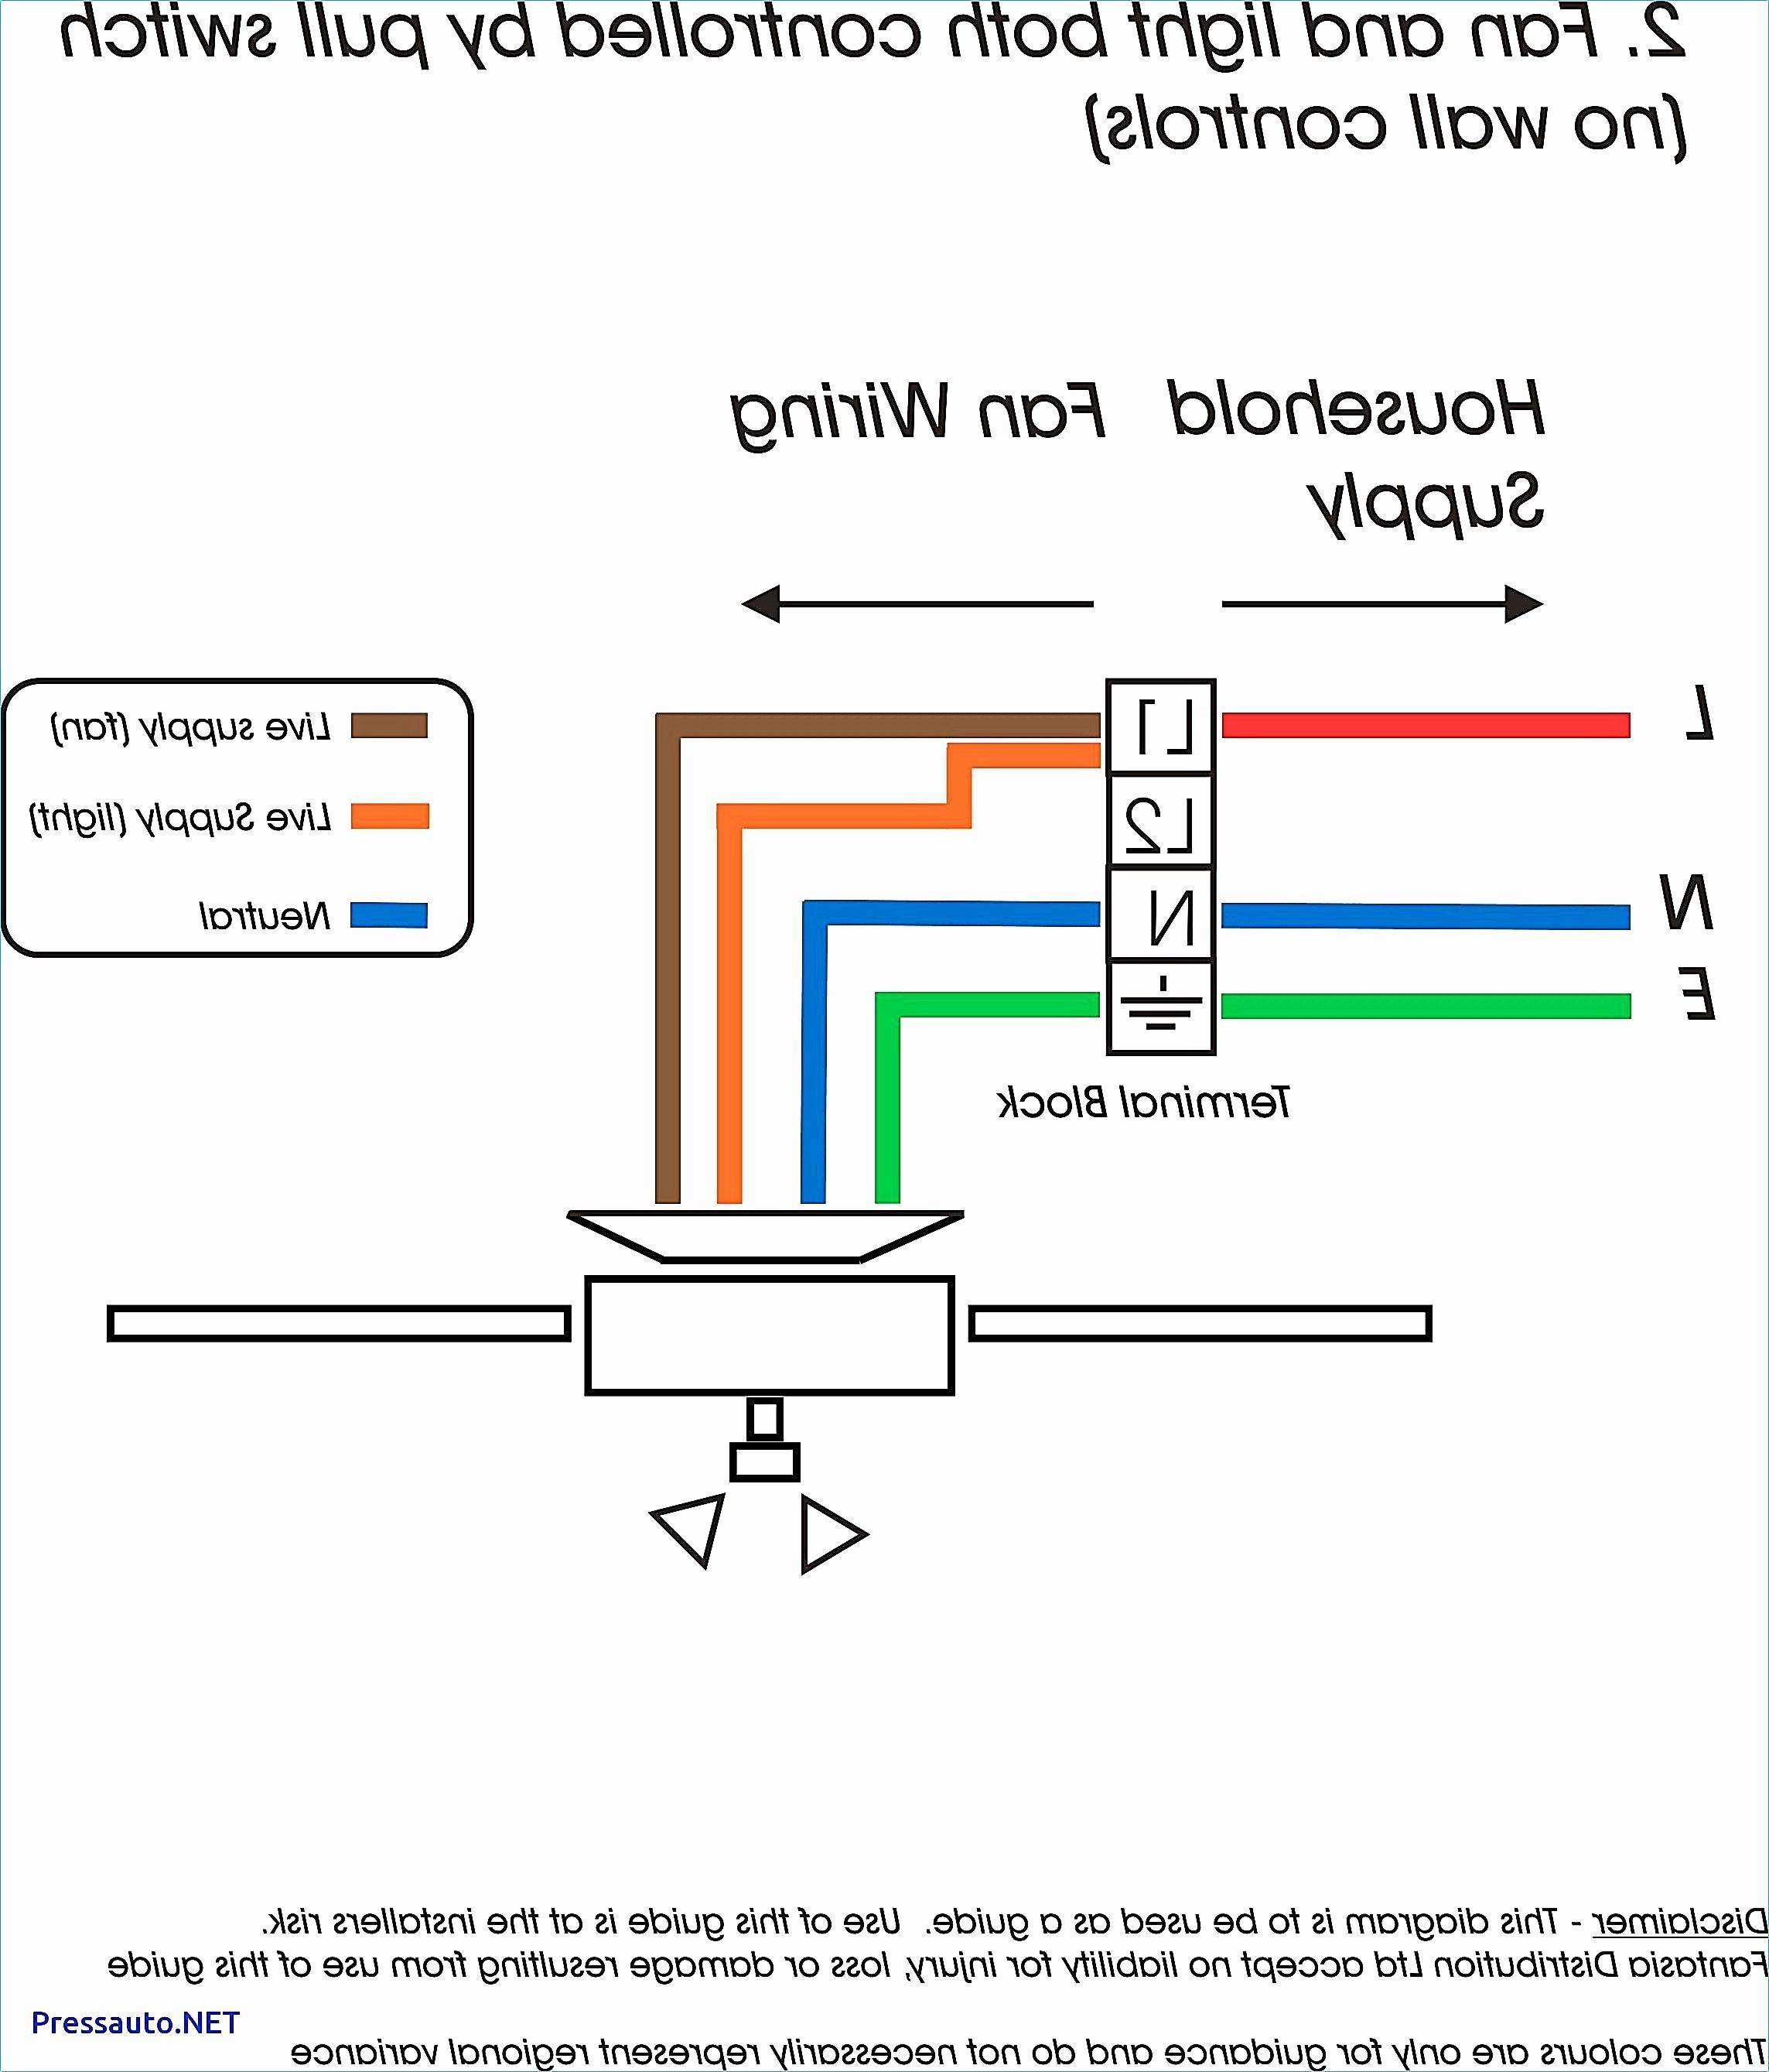 Pioneer Avic N2 Wiring Diagram Wire Diagram for Pioneer Radio Detailed Schematic Diagrams Of Pioneer Avic N2 Wiring Diagram